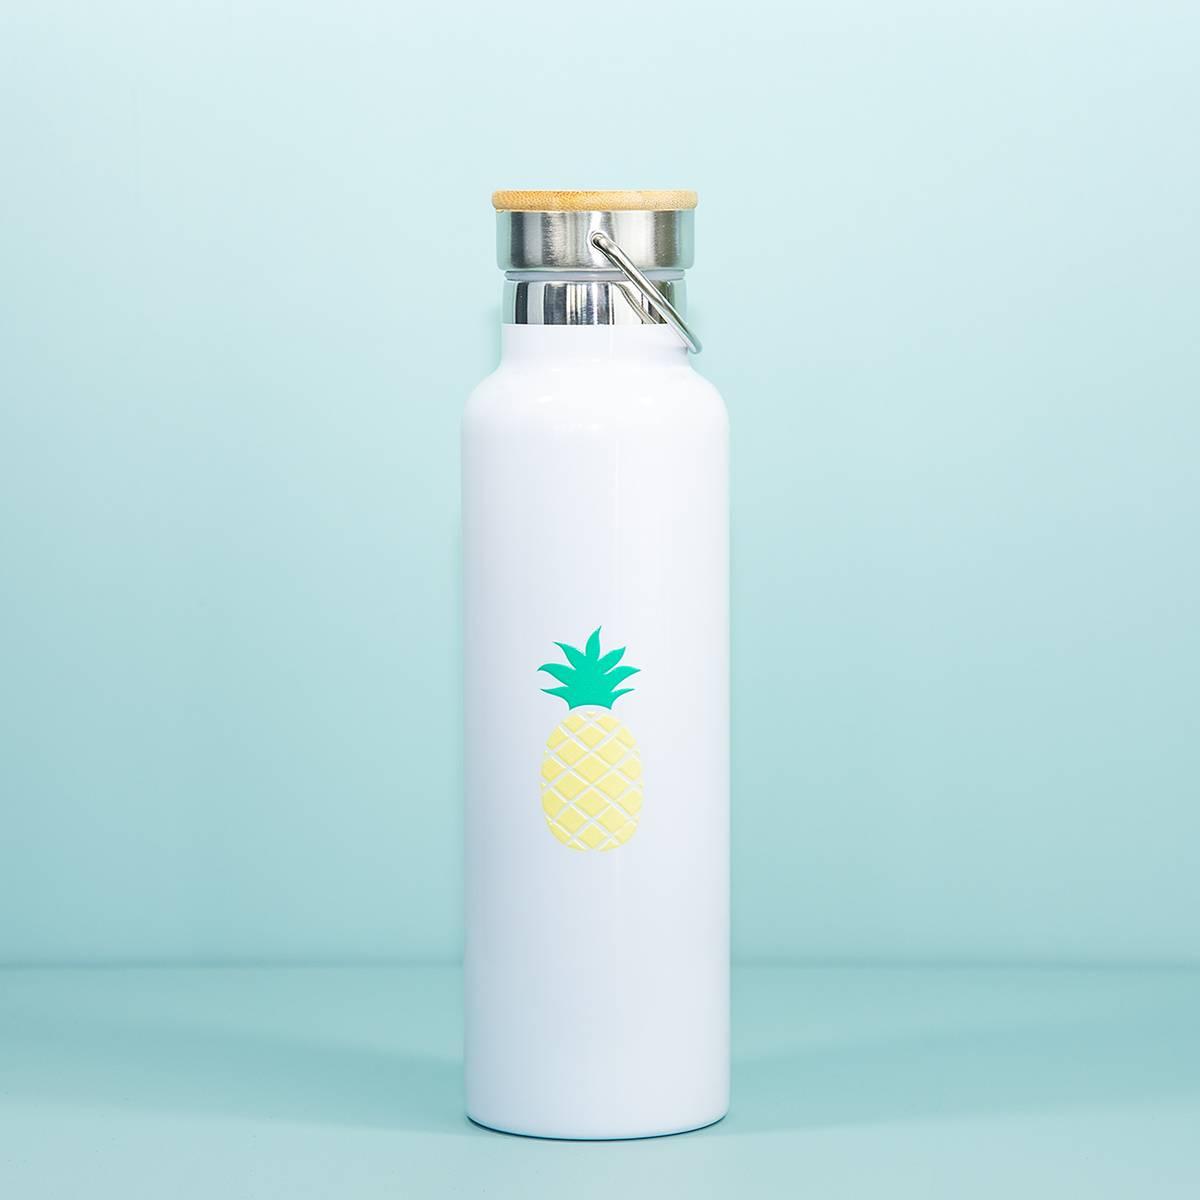 Drikkeflaske Ananas 600 ml - Rustfritt Stål